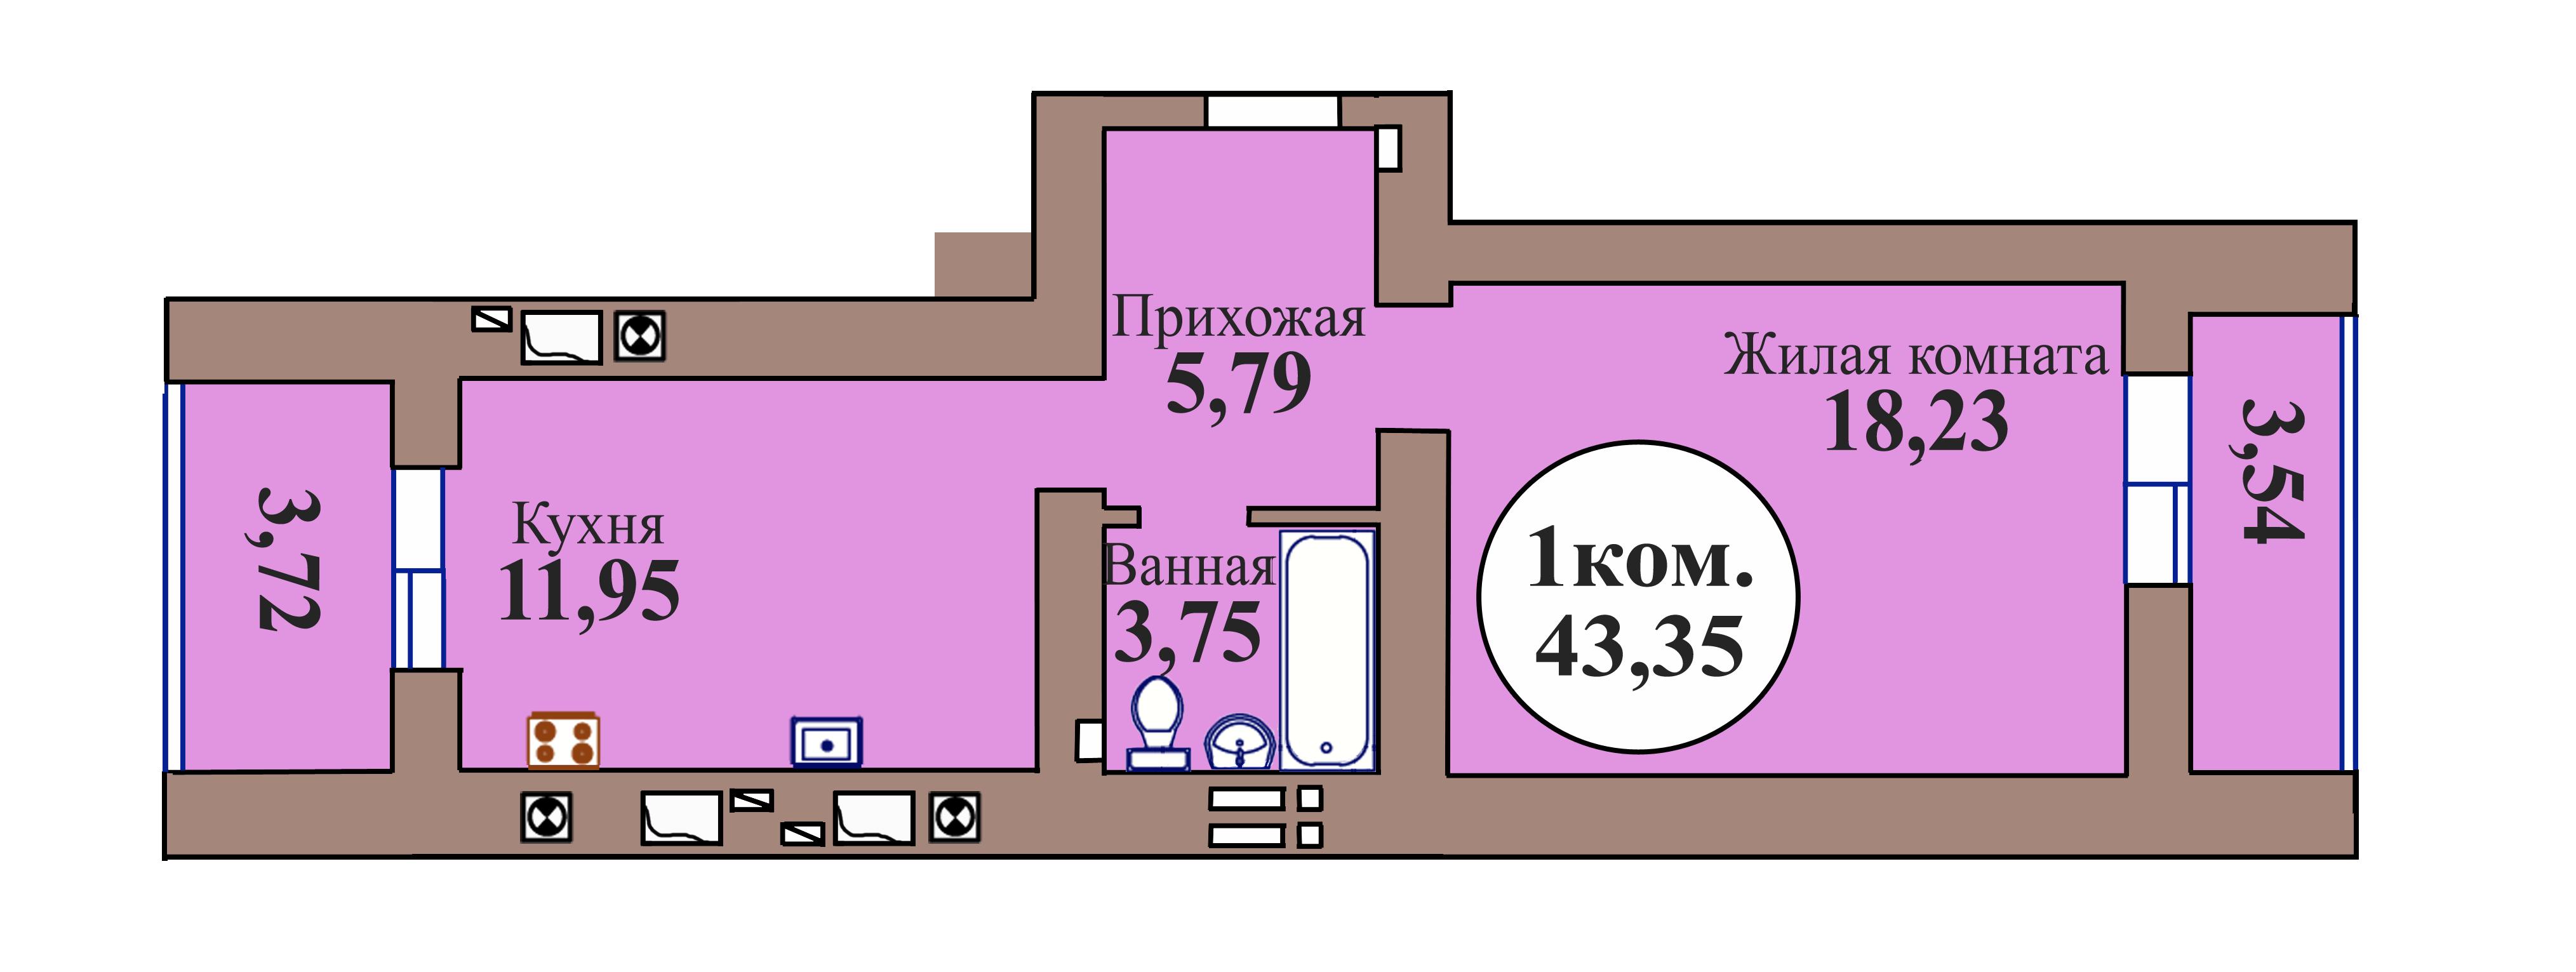 1-комн. кв. по пер. Калининградский, 5 кв. 58 в Калининграде